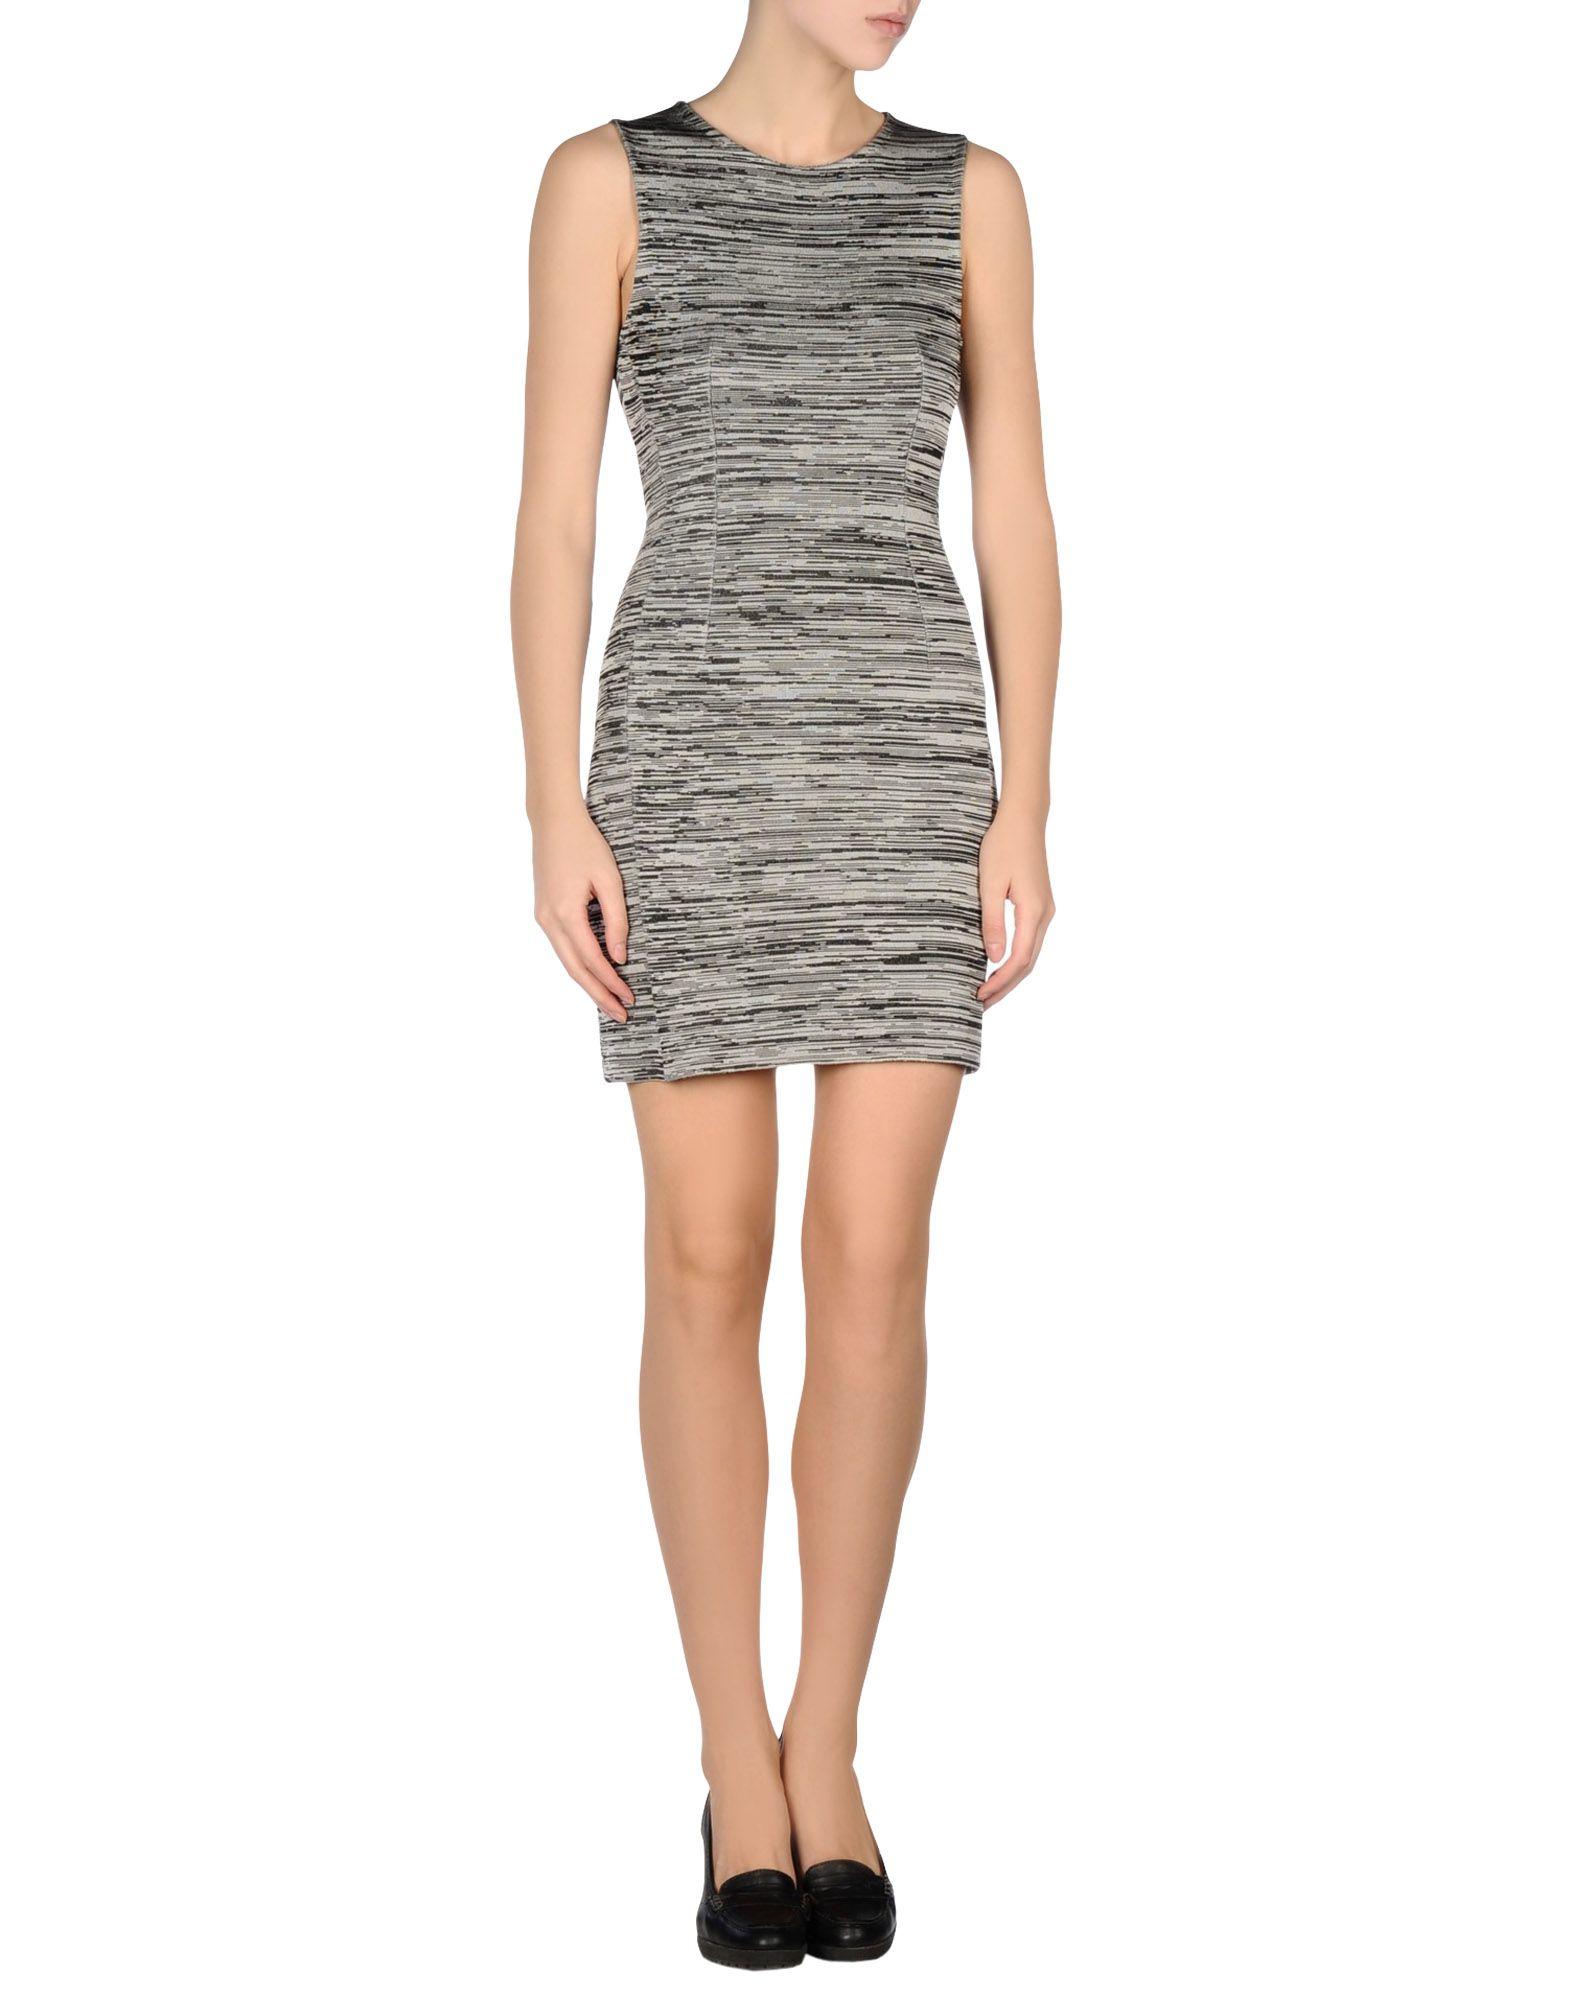 dior short dresses - photo #5